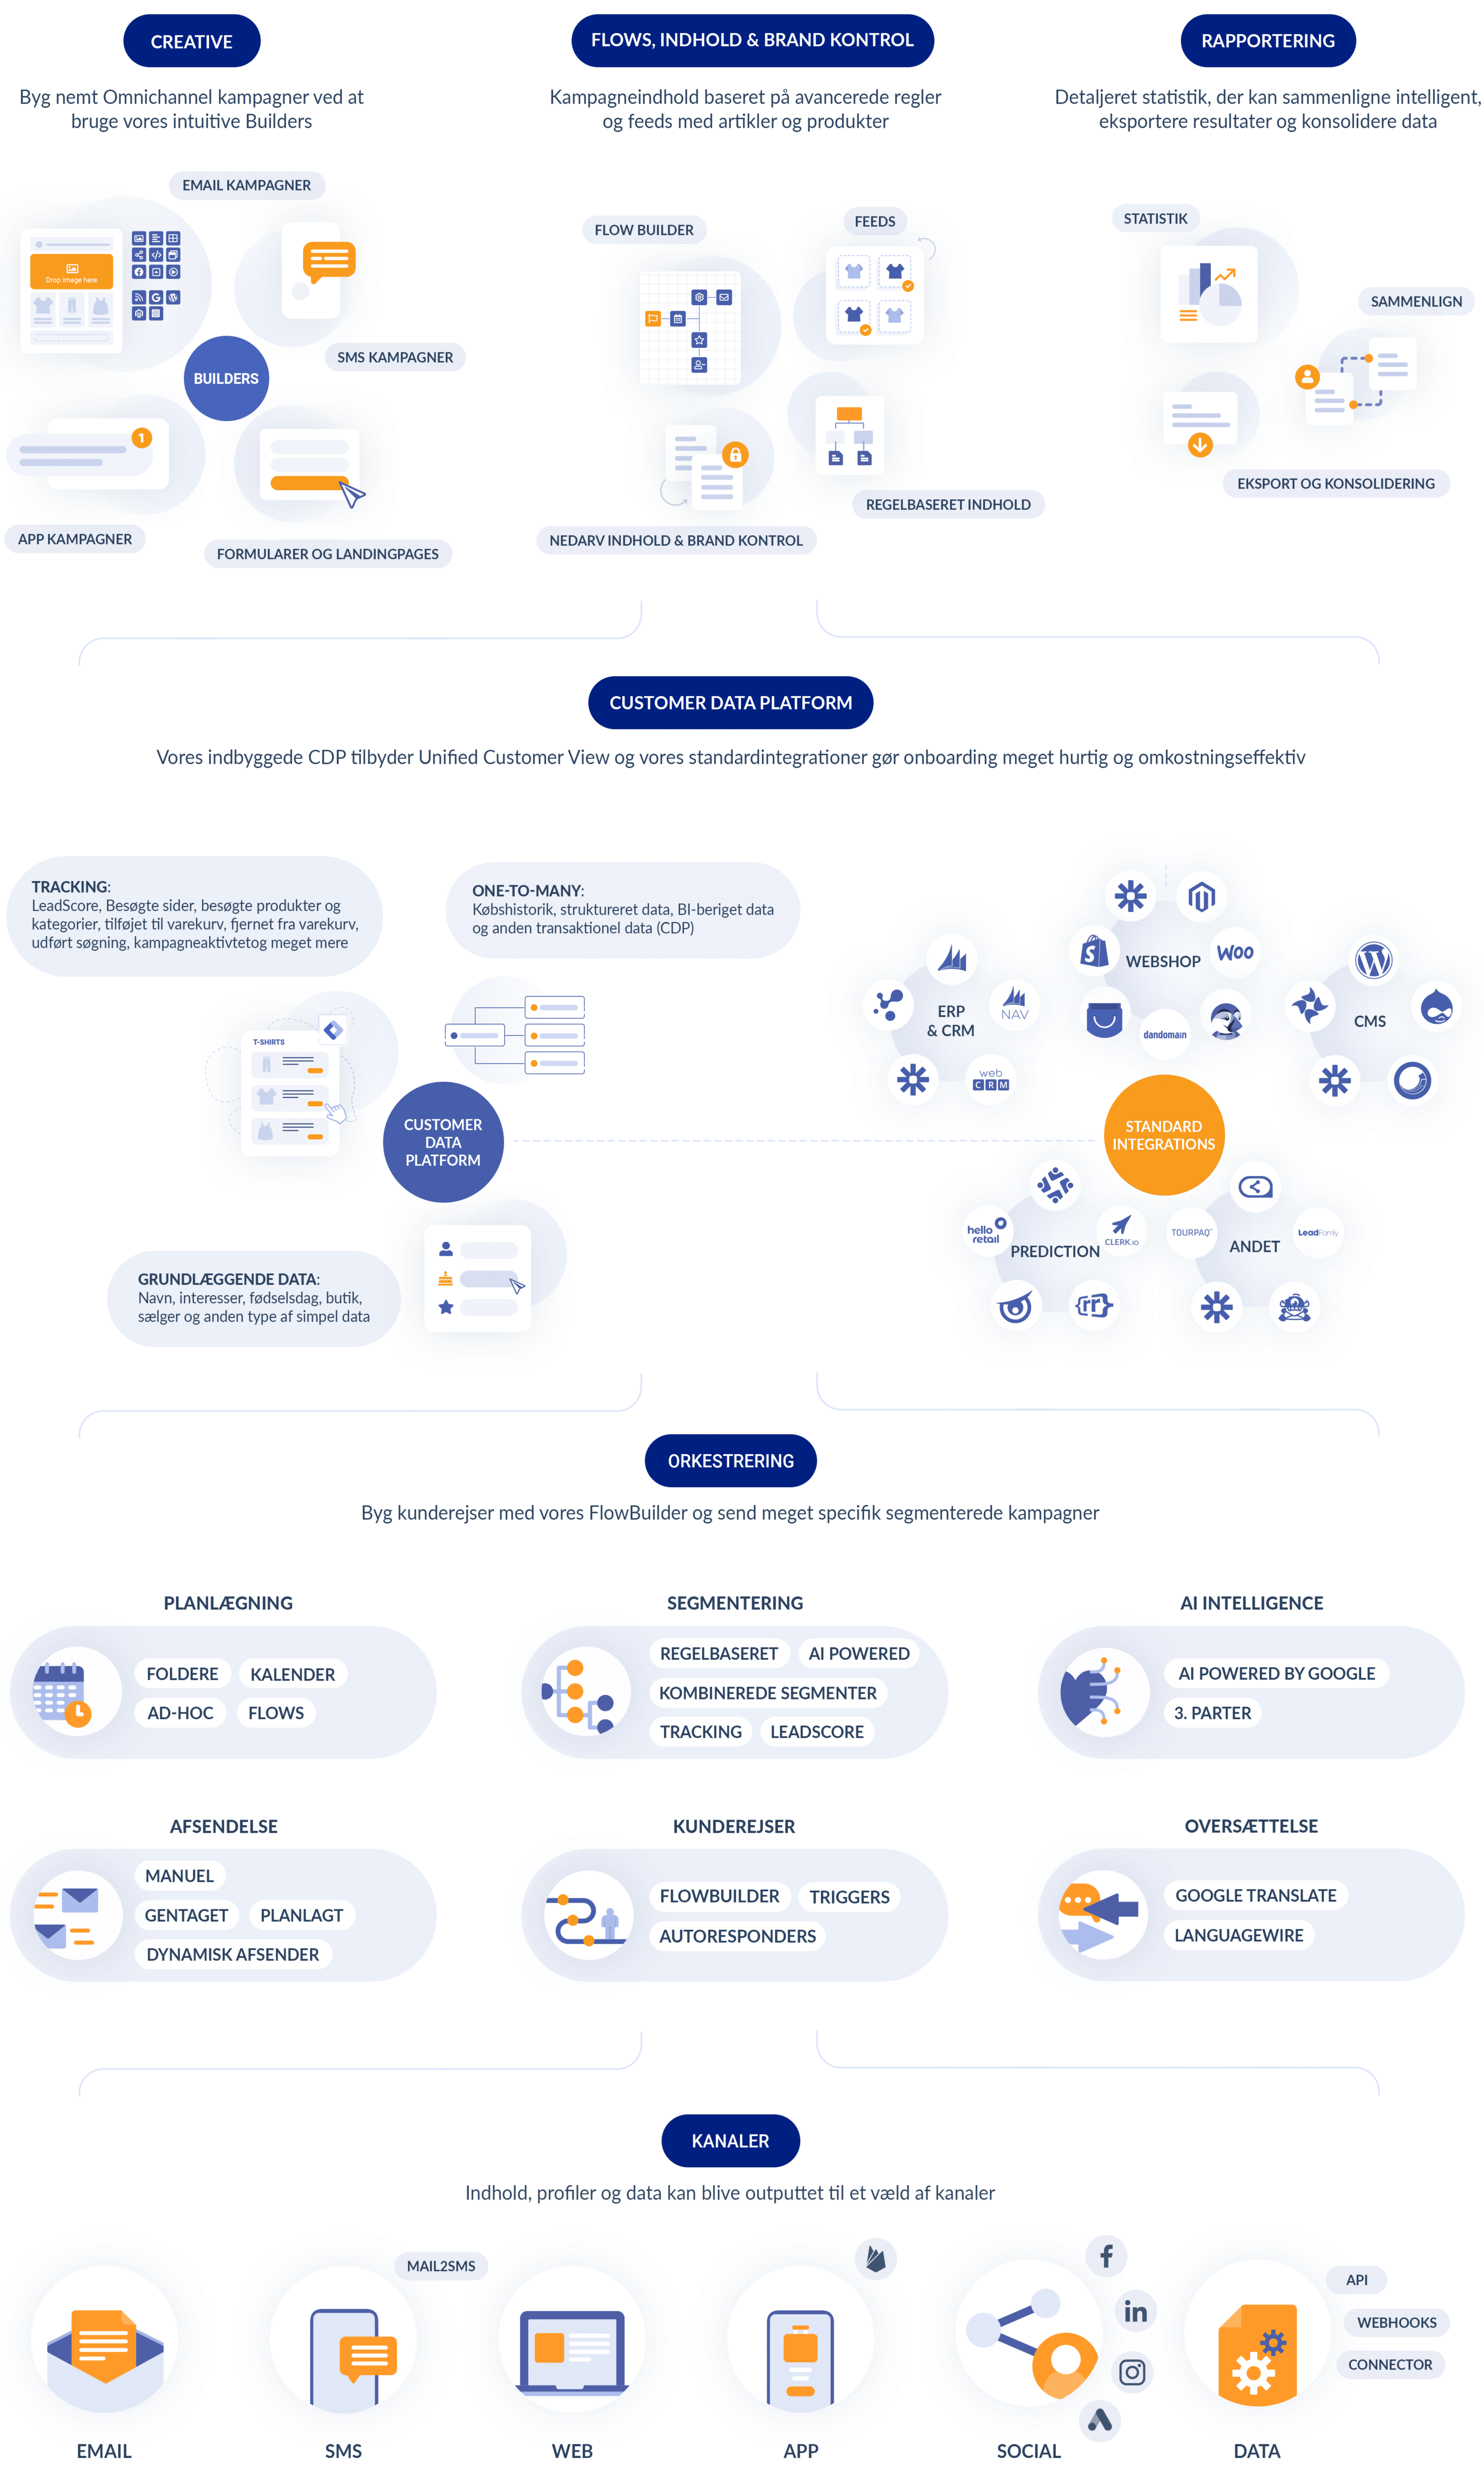 customer-data-platform-marketingplatform